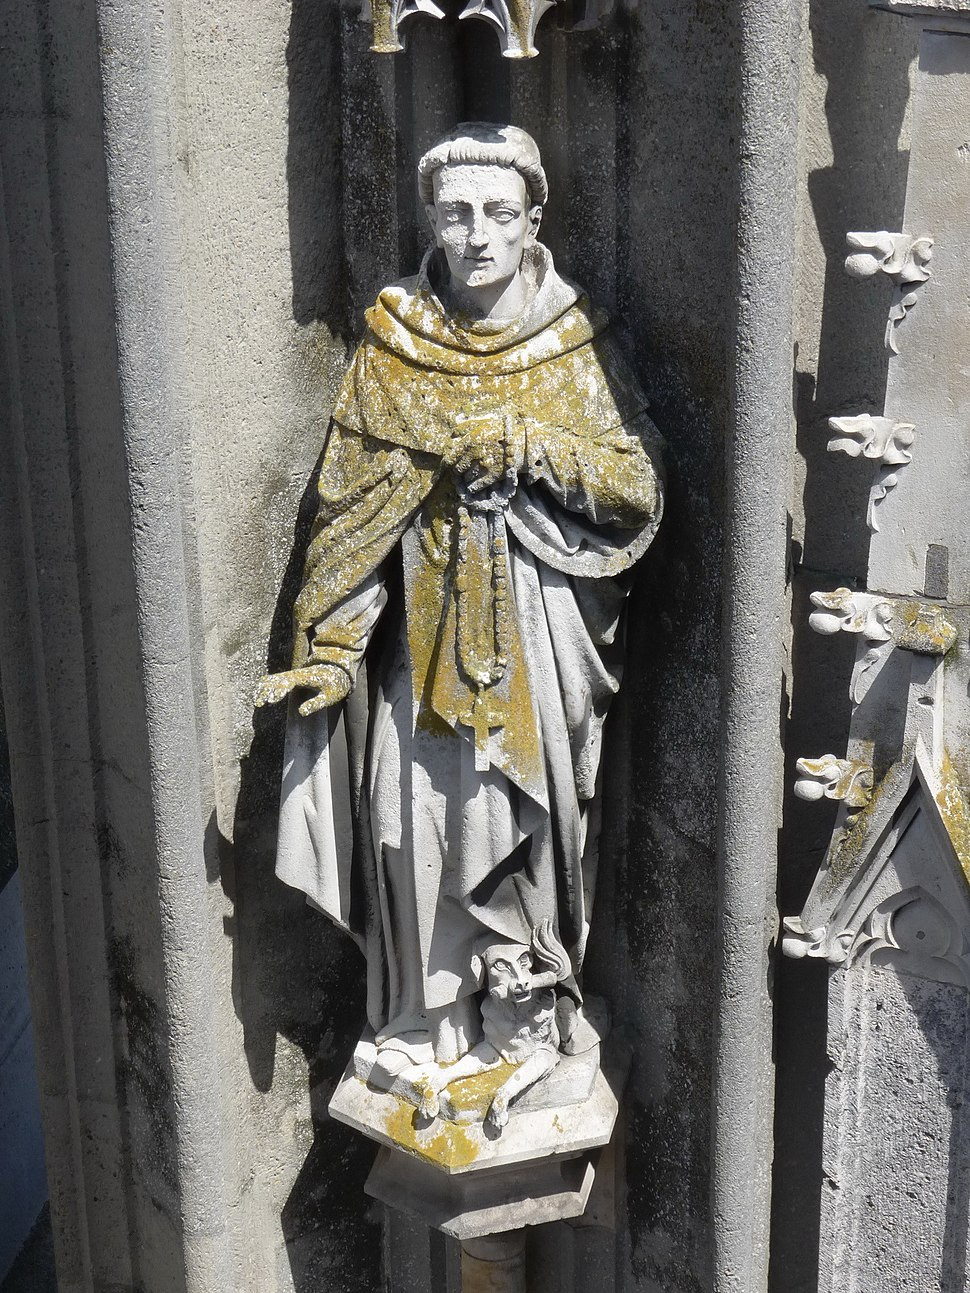 Der Heilige Dominikus am Nordturm des Regensburger Doms